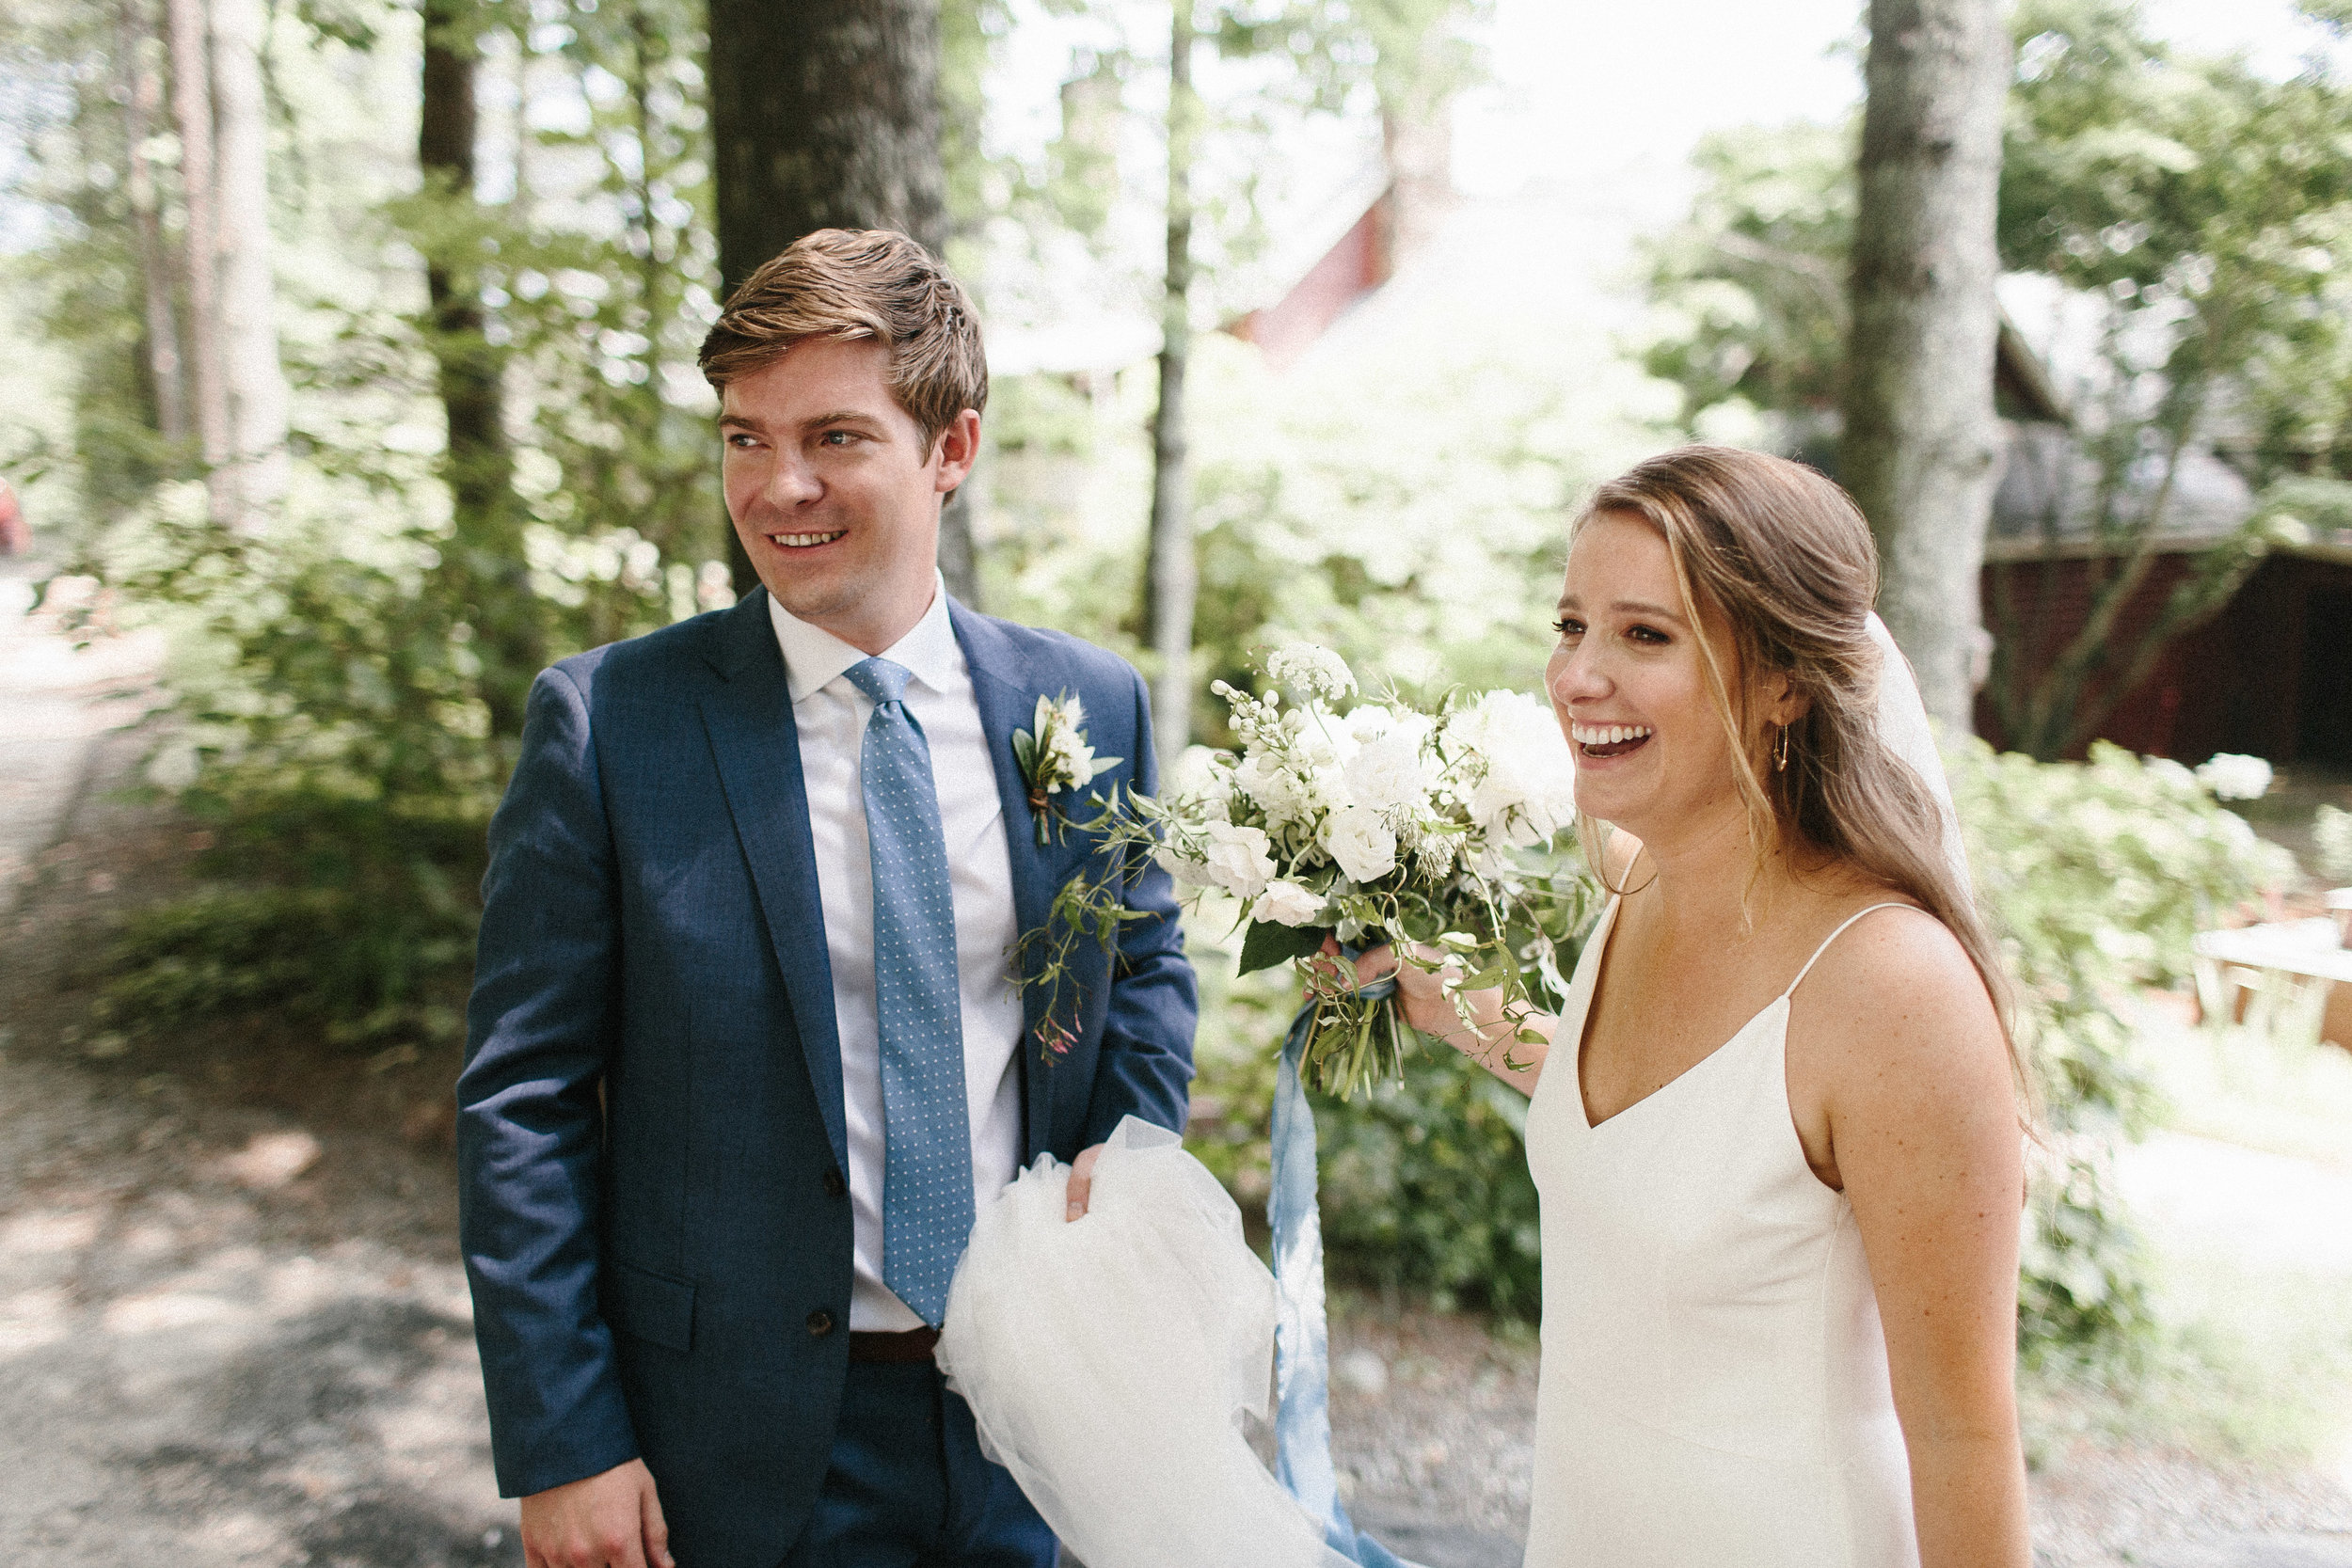 glen_ella_meadow_creekside_atlanta_wedding_photographers_1398.jpg